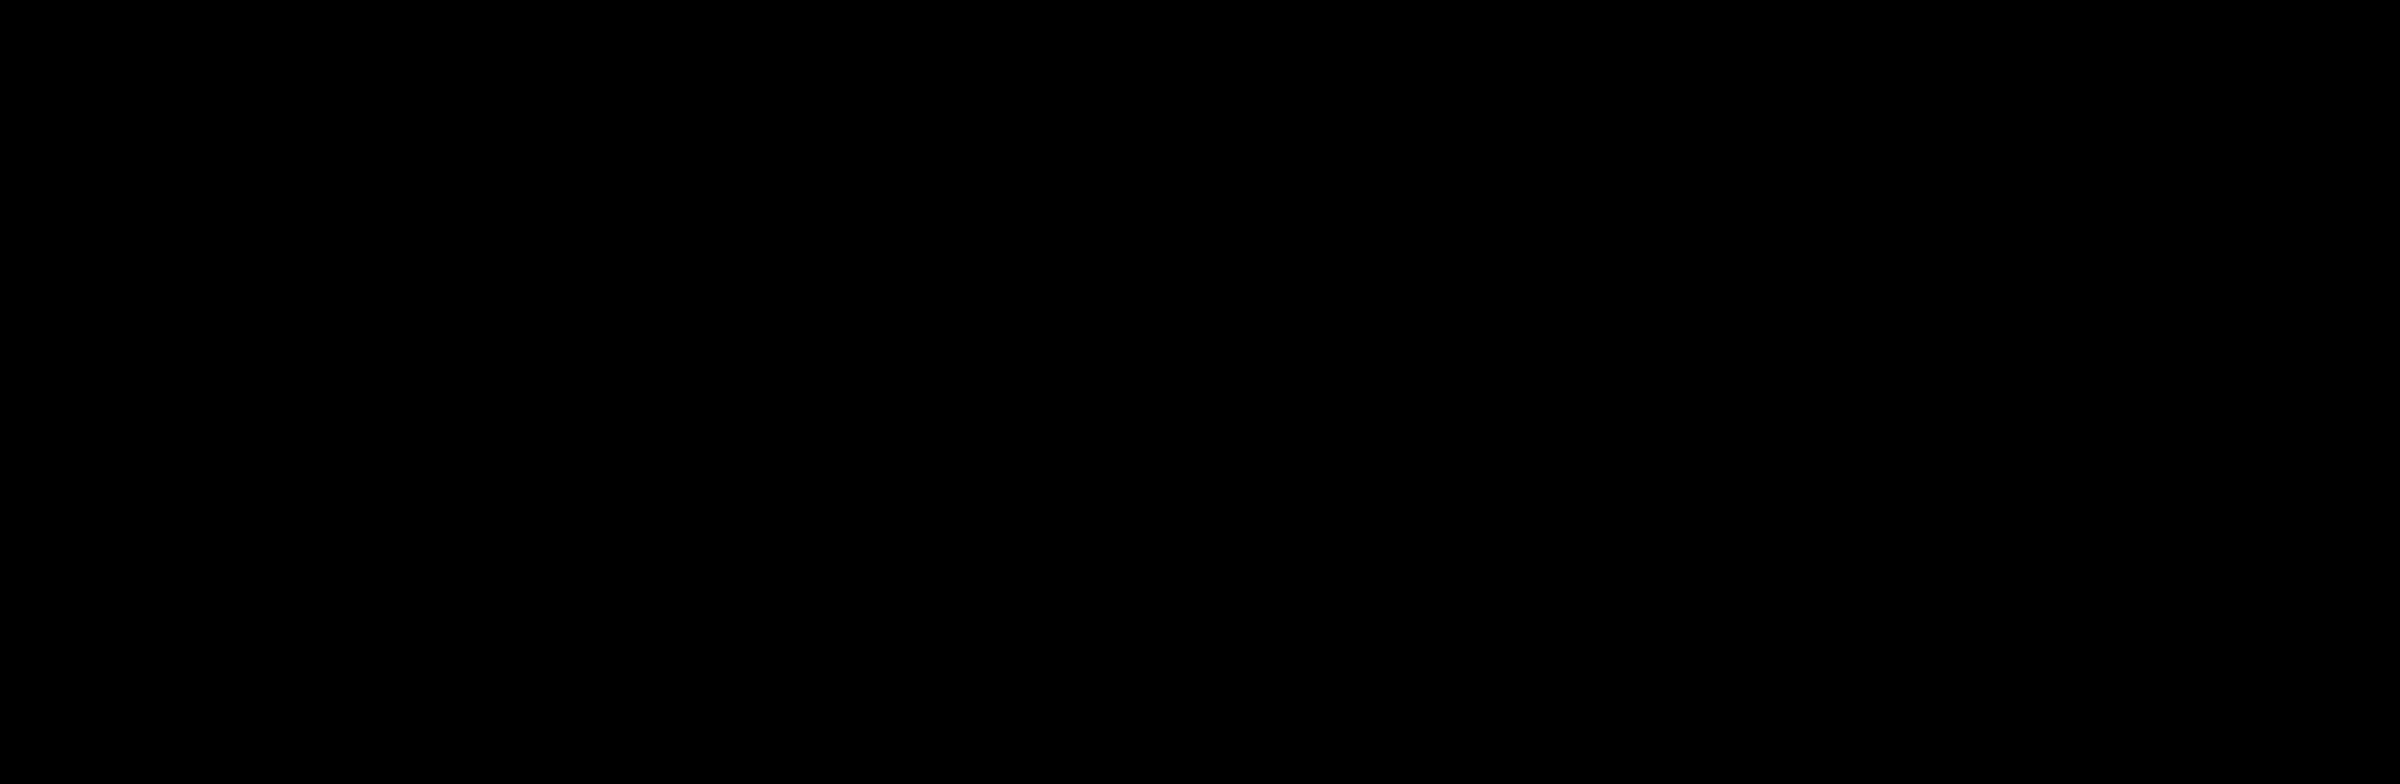 Clipart Electronic Logic Symbol Or